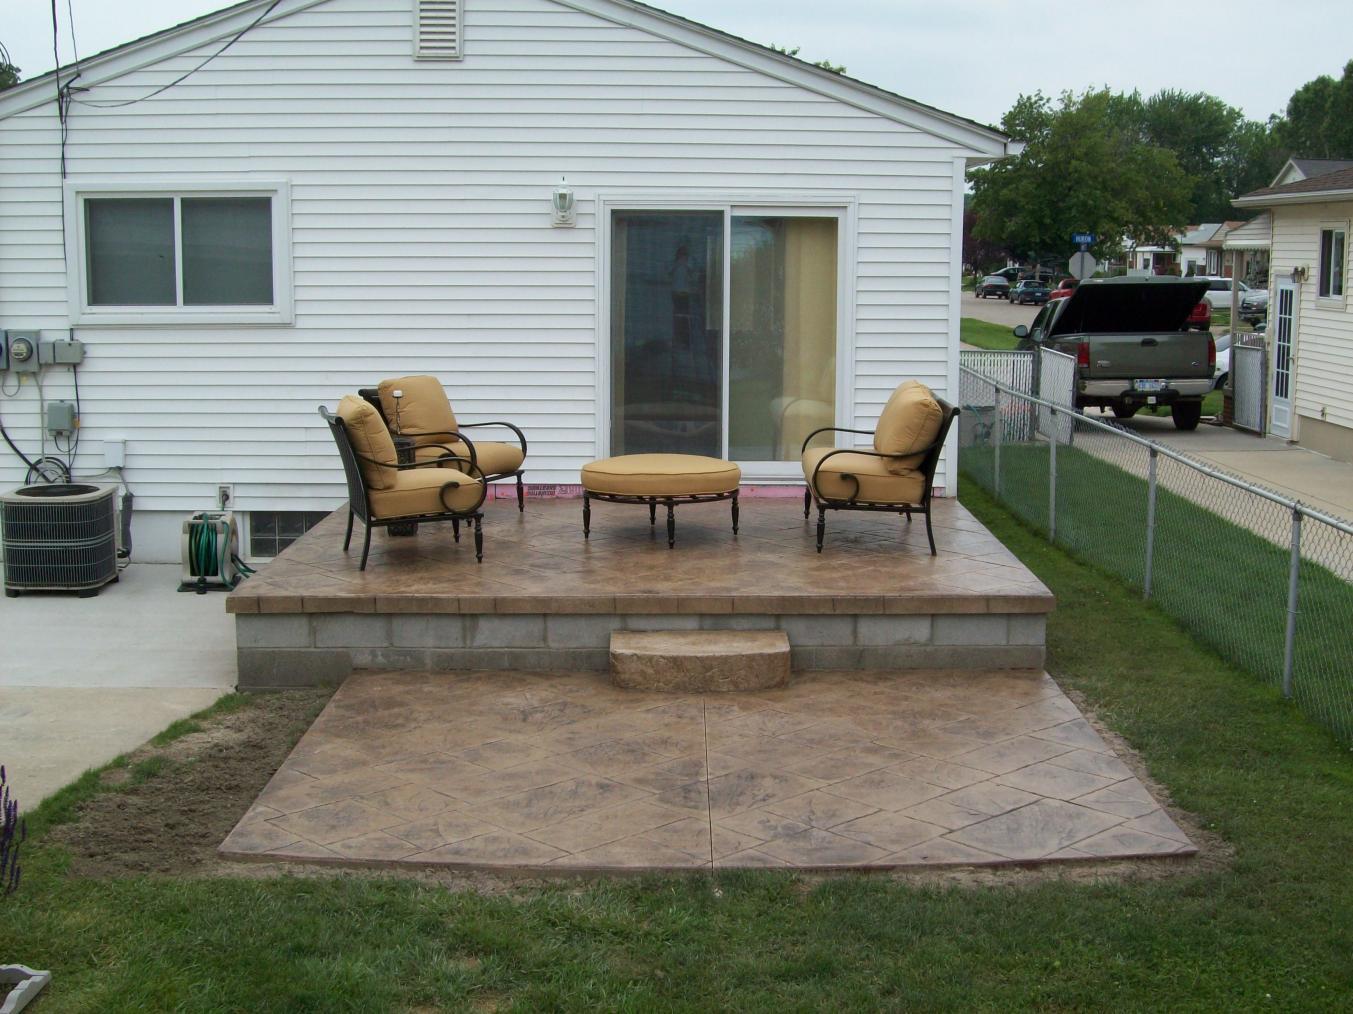 Building Detached Pergola On Concrete, Need Advice ... on Diy Concrete Patio Ideas id=53601